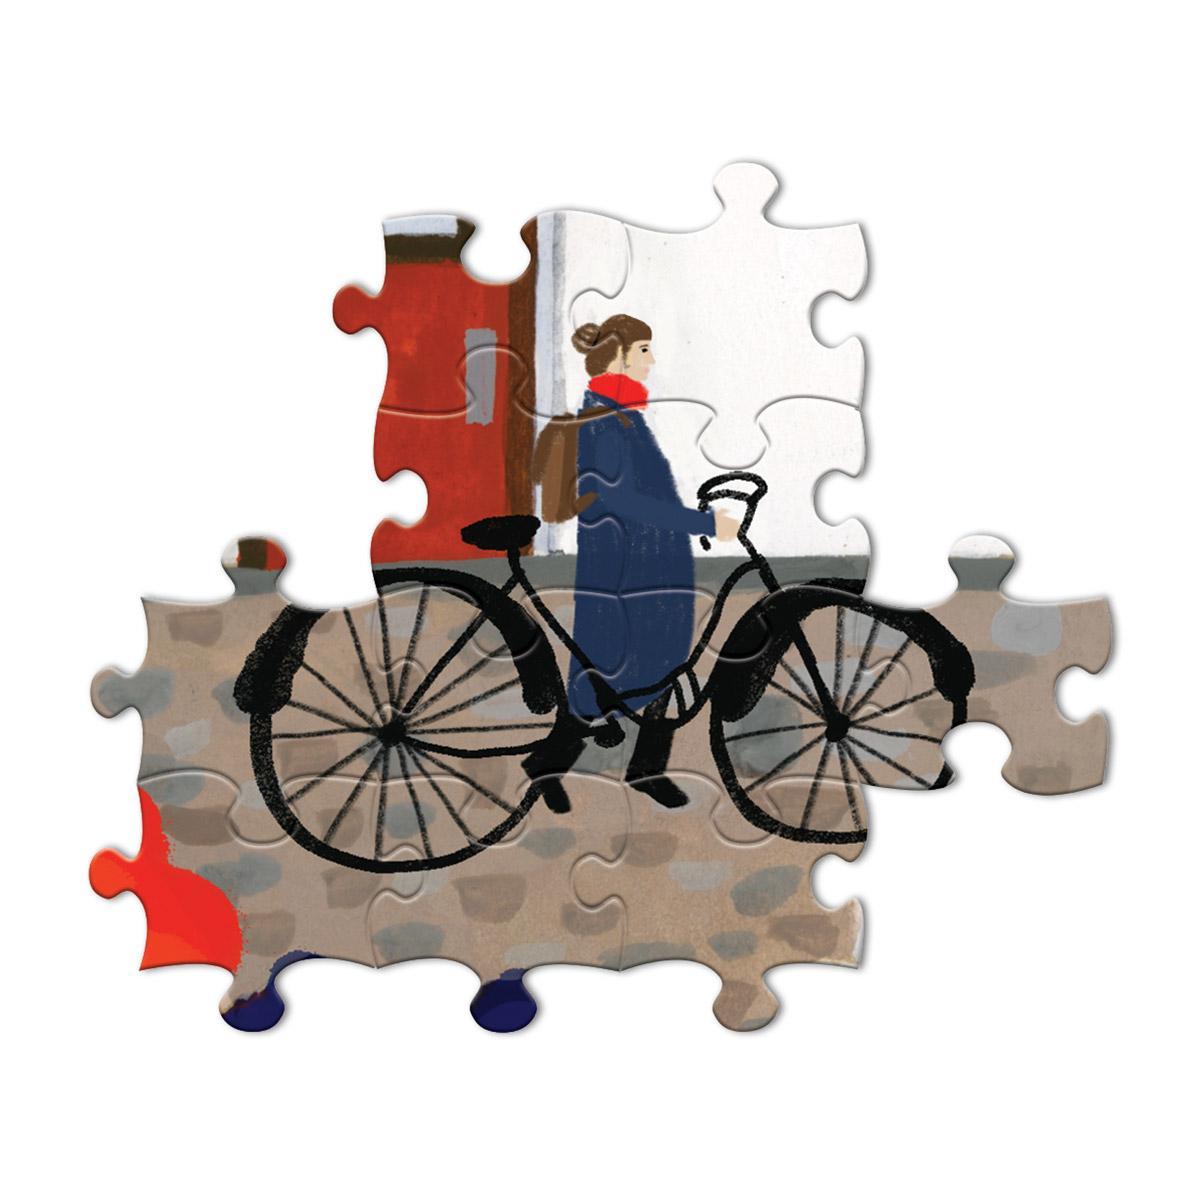 Whimsical Village 1000 Piece Puzzle